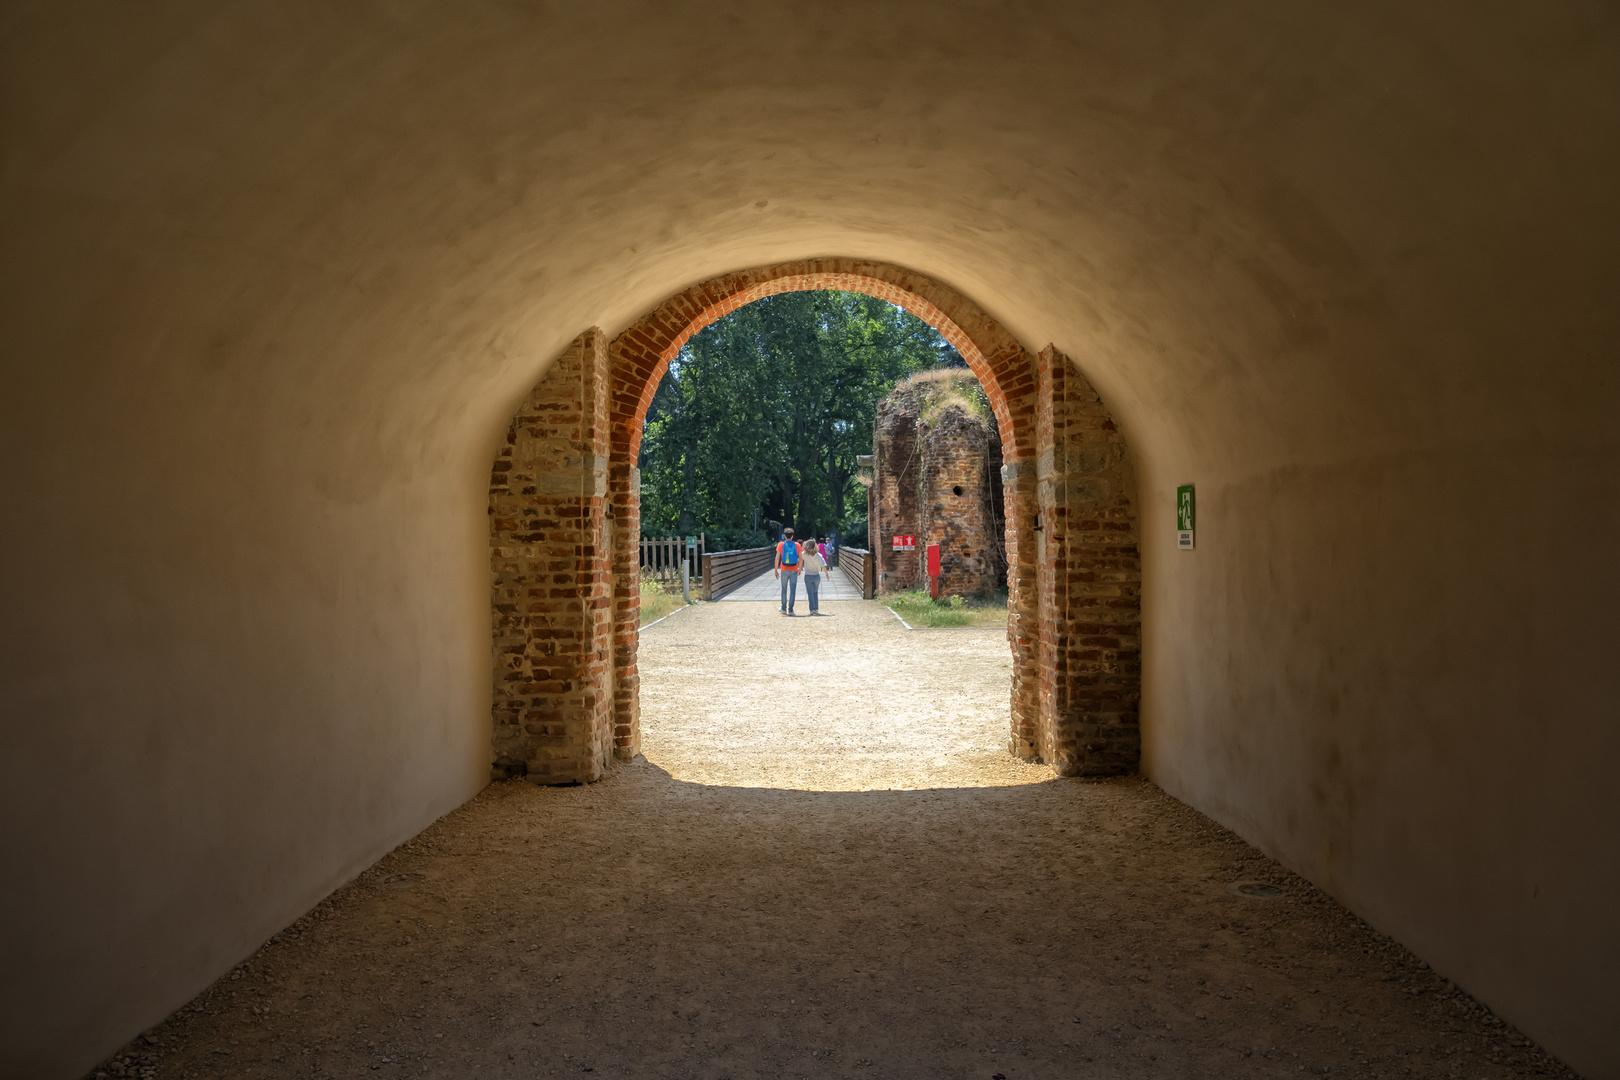 Castello Visconteo di Novara, portico